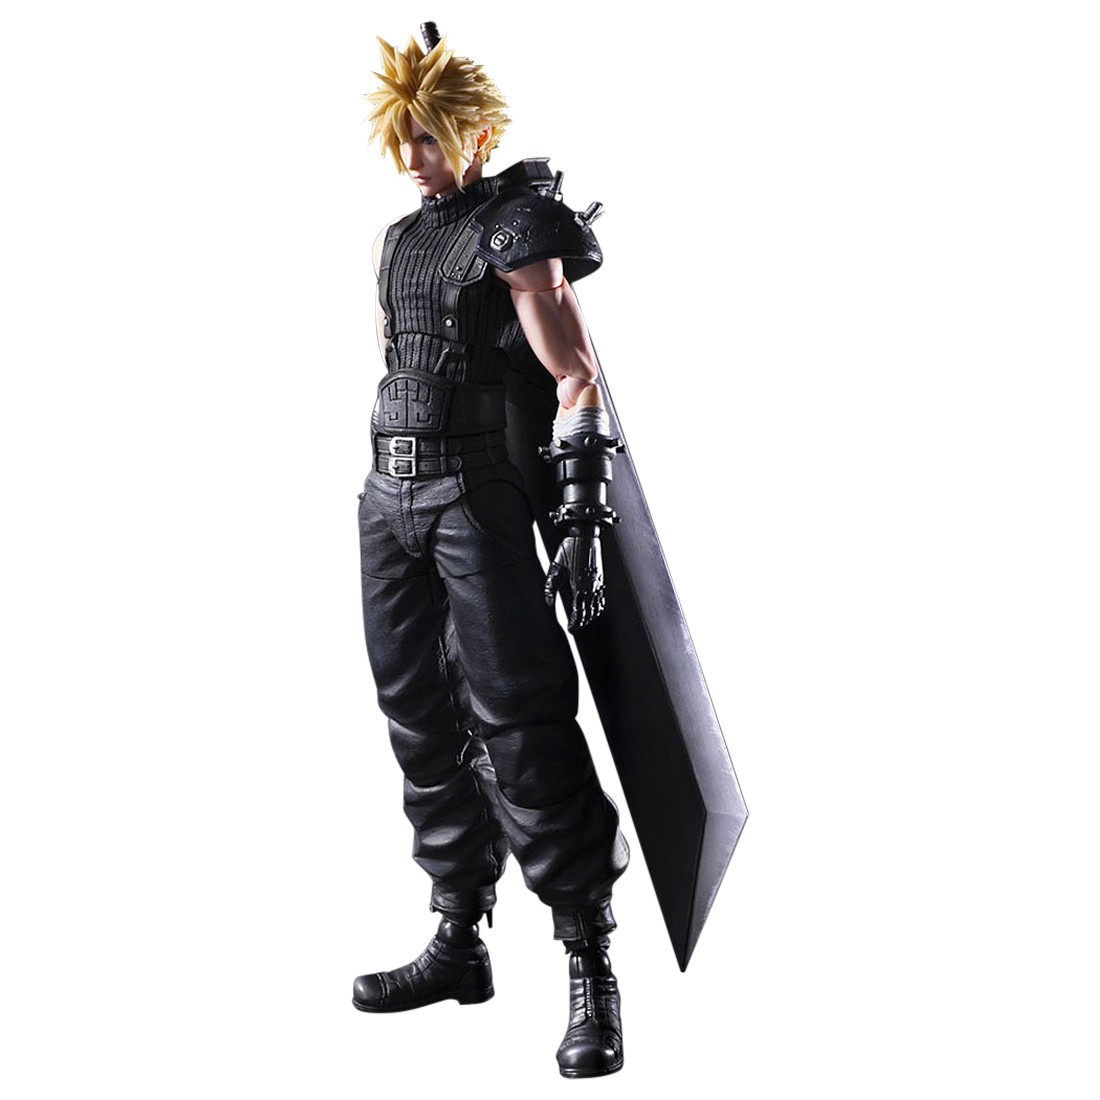 Square Enix Final Fantasy VII Remake Play Arts Kai Cloud Strife Ver. 2 Figure (black)